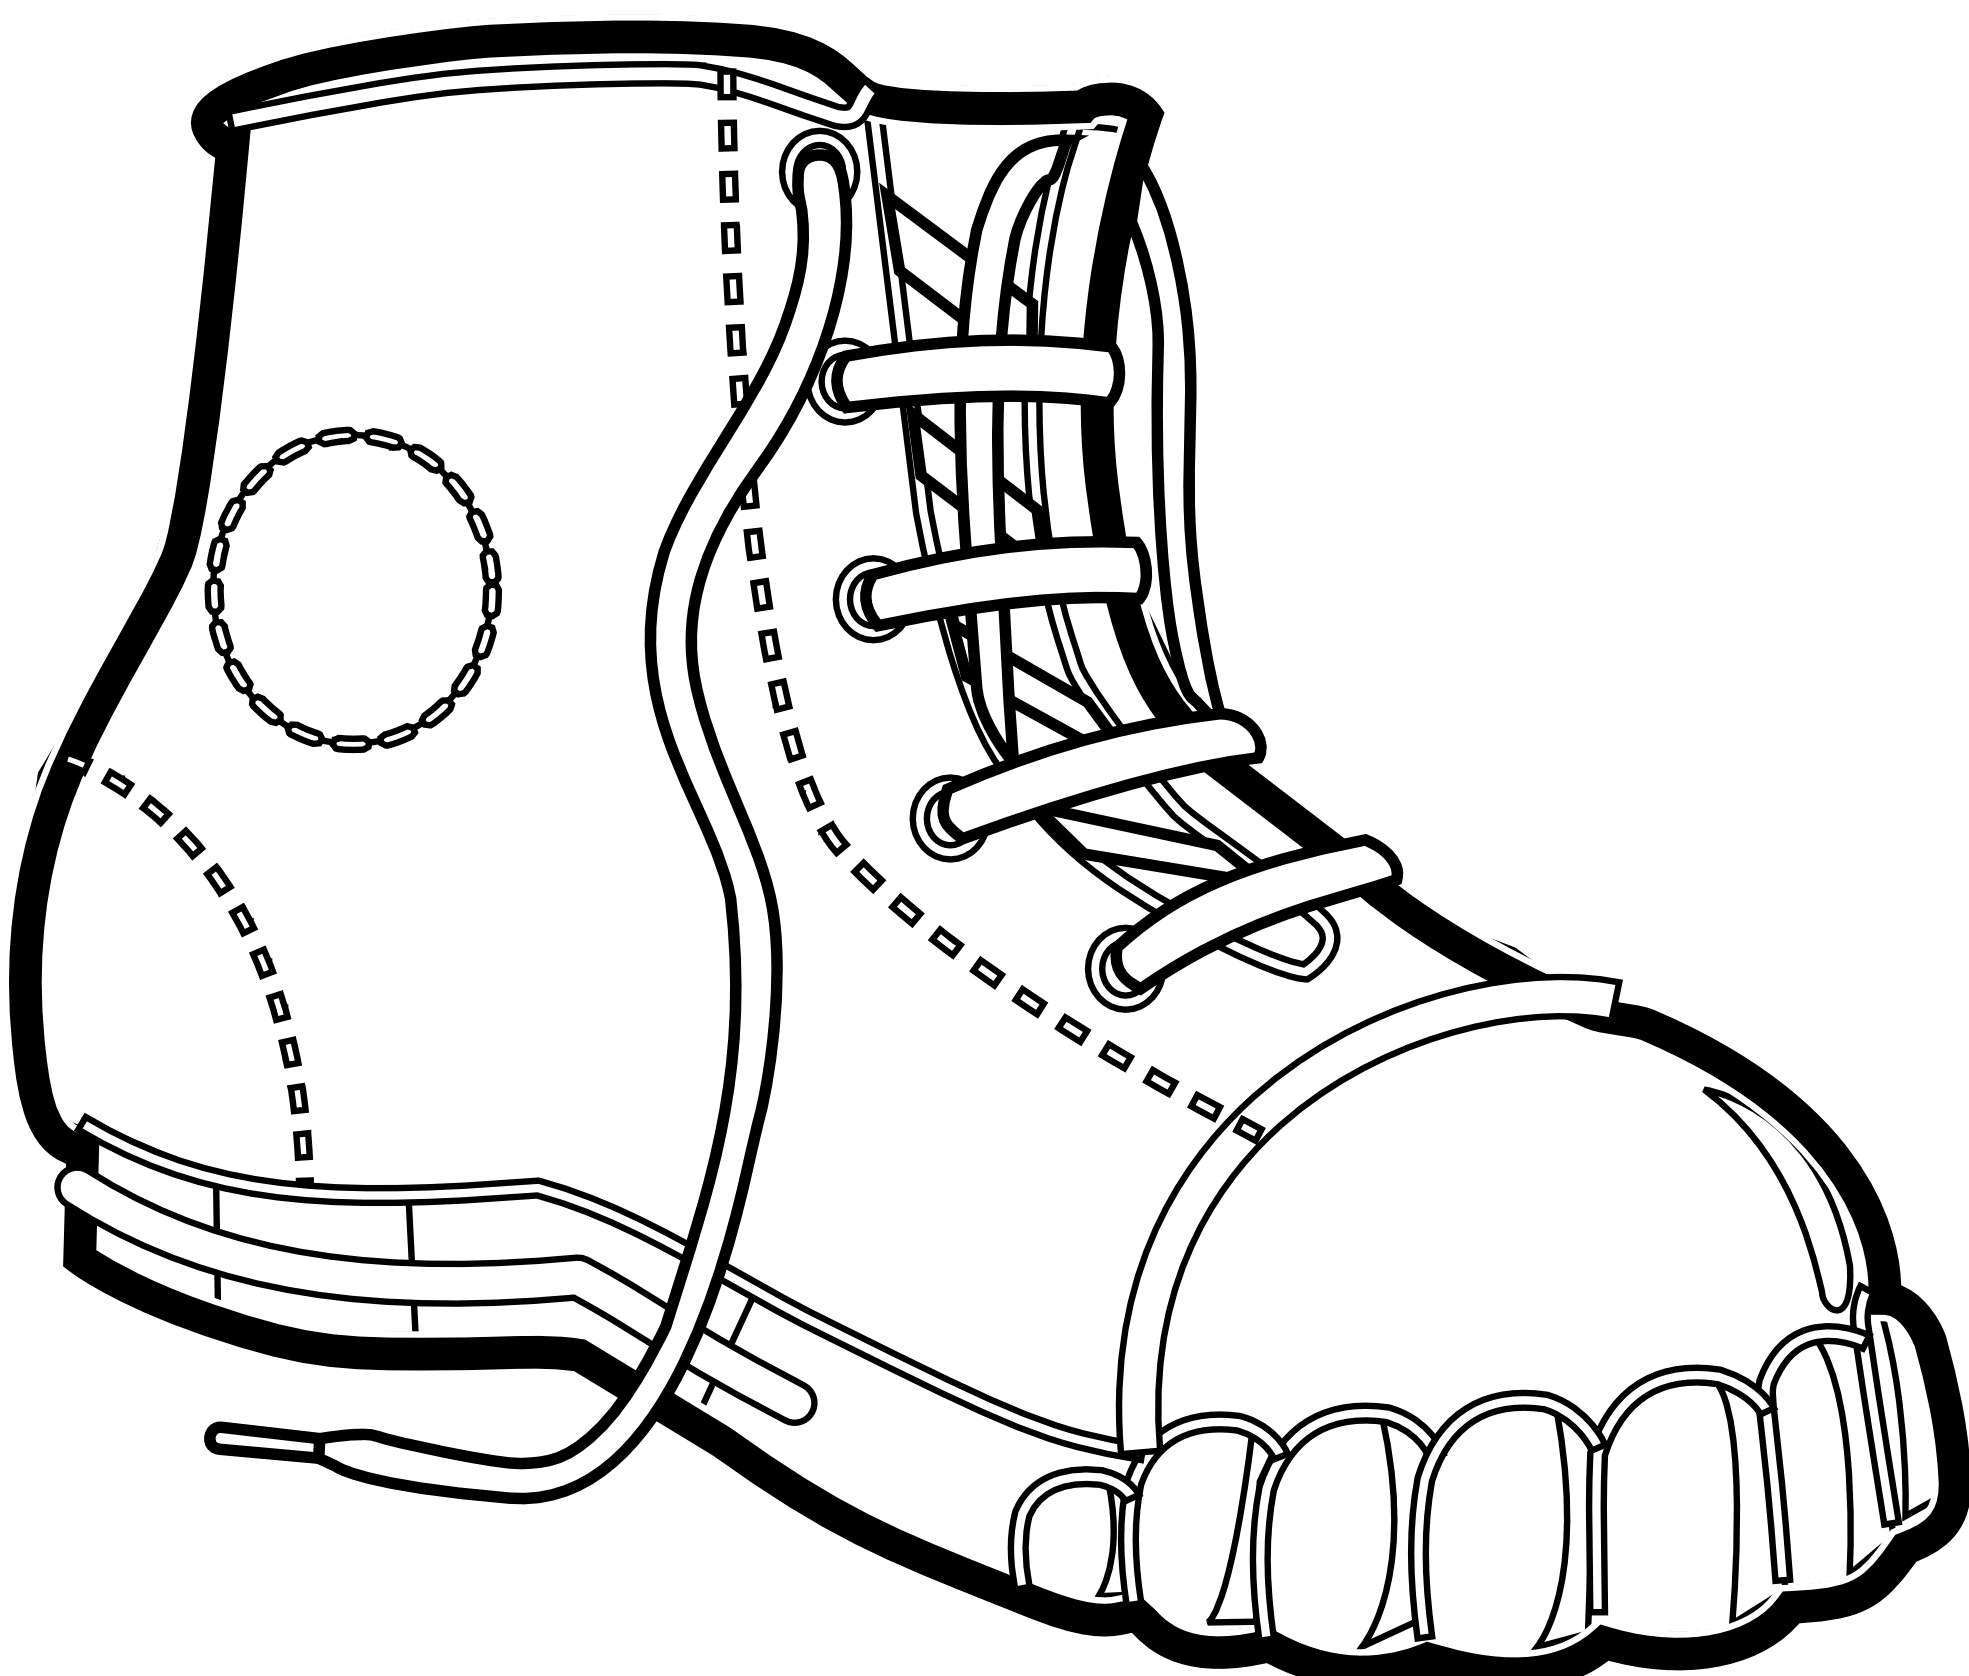 Rain boots clipart black and white 4 » Clipart Portal.